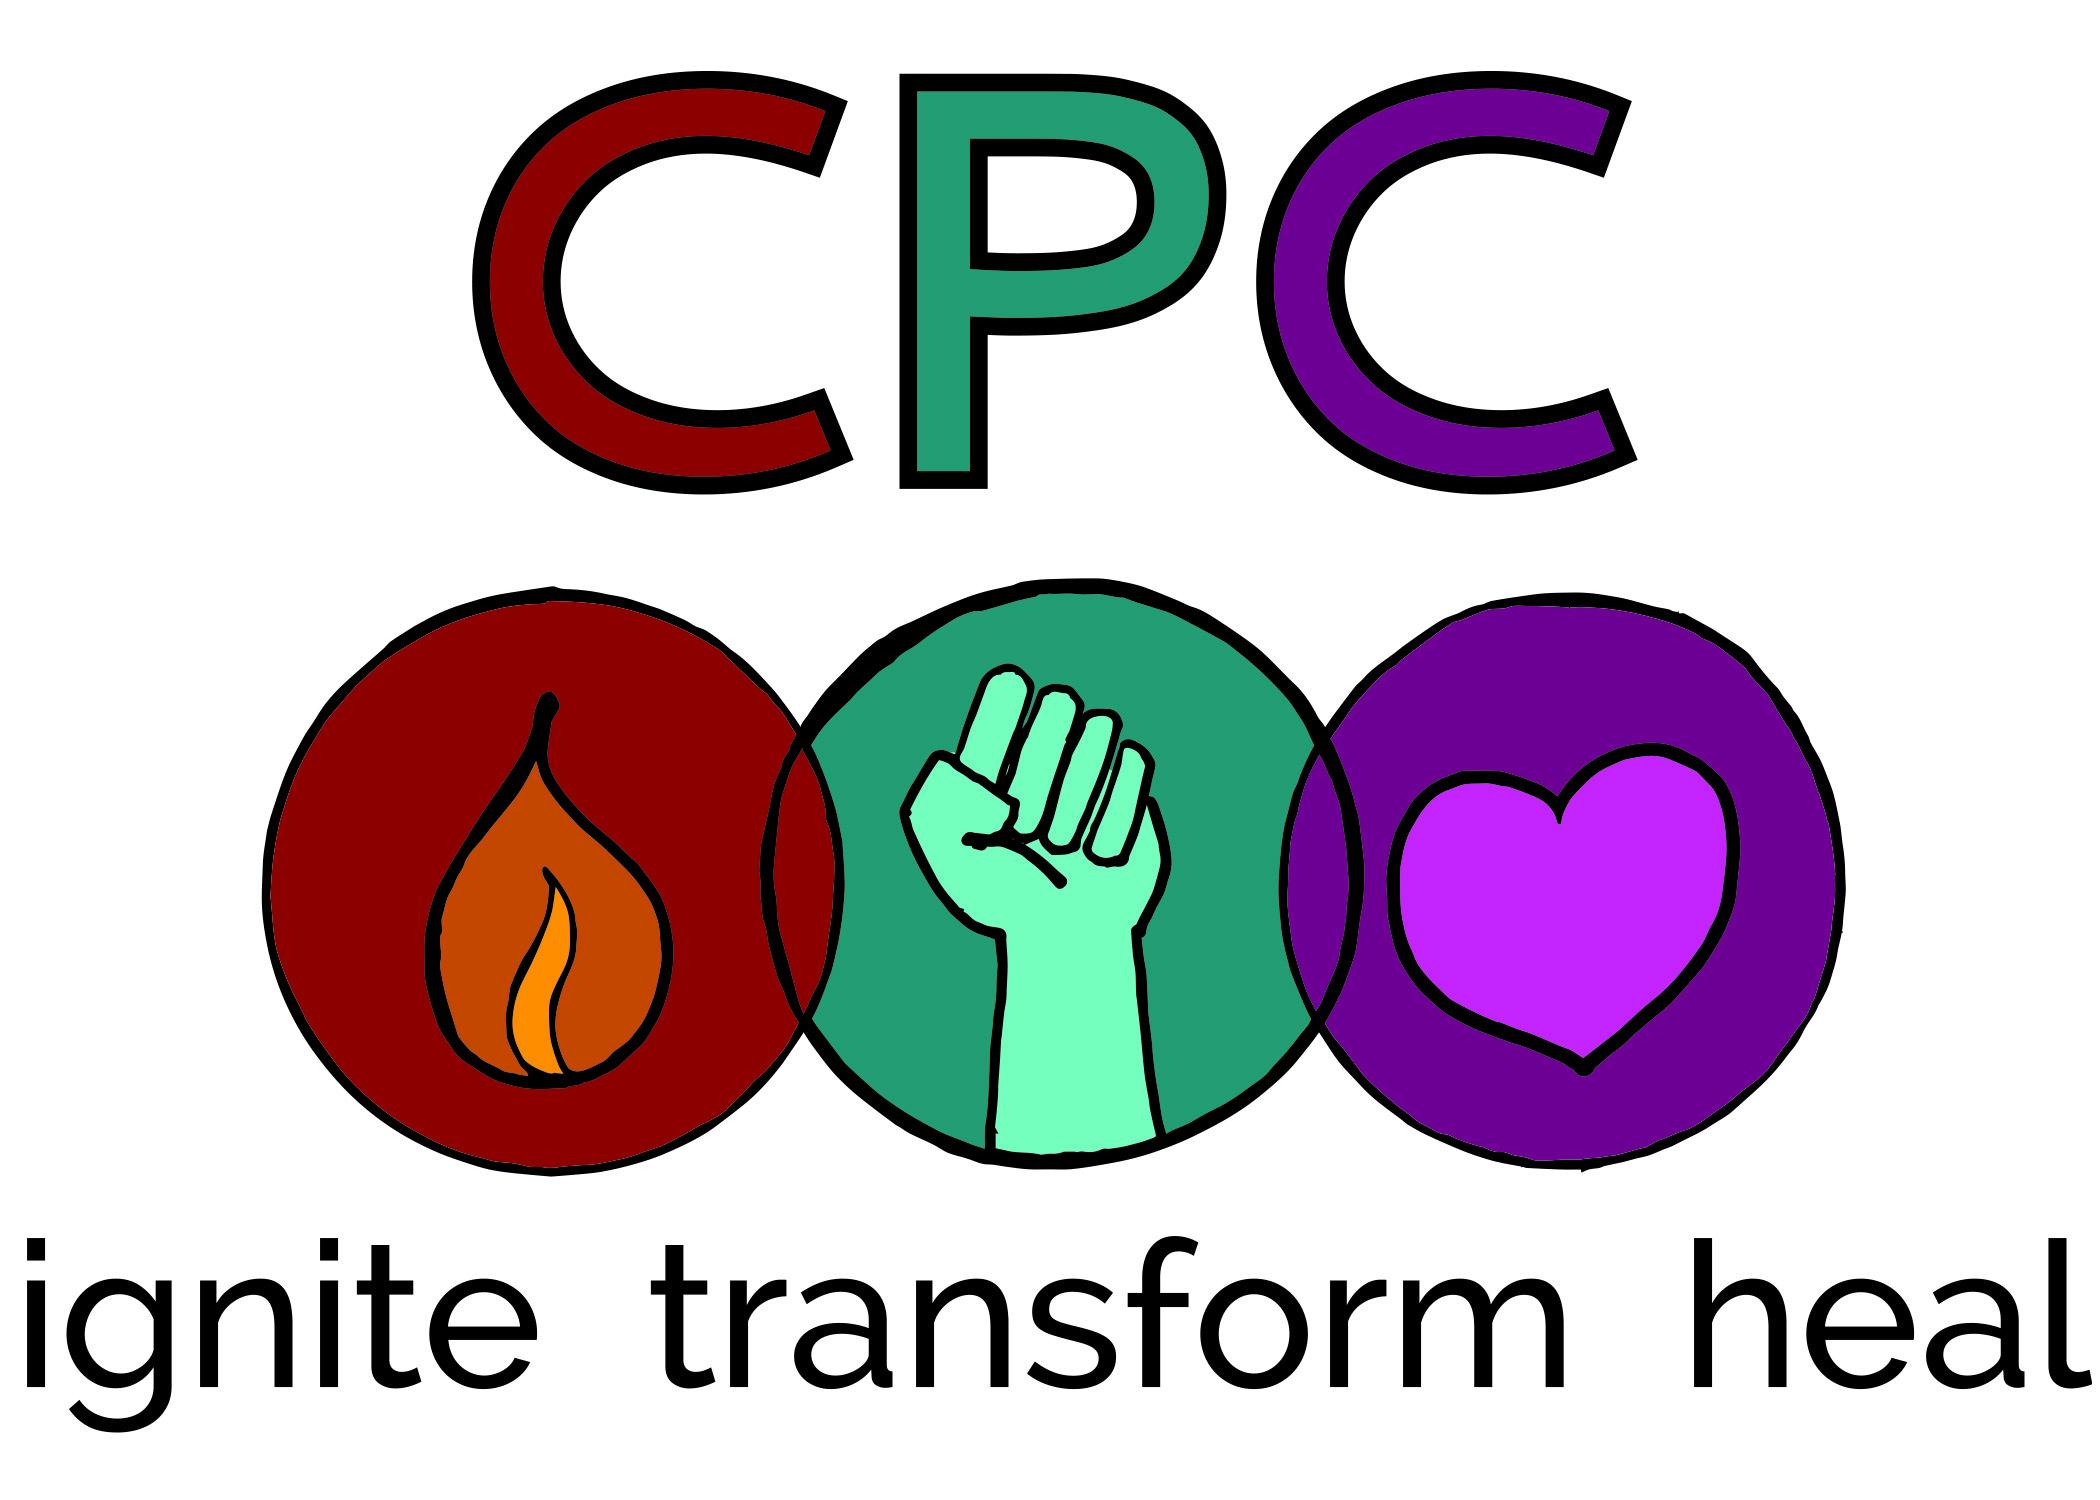 CPClogo.jpg